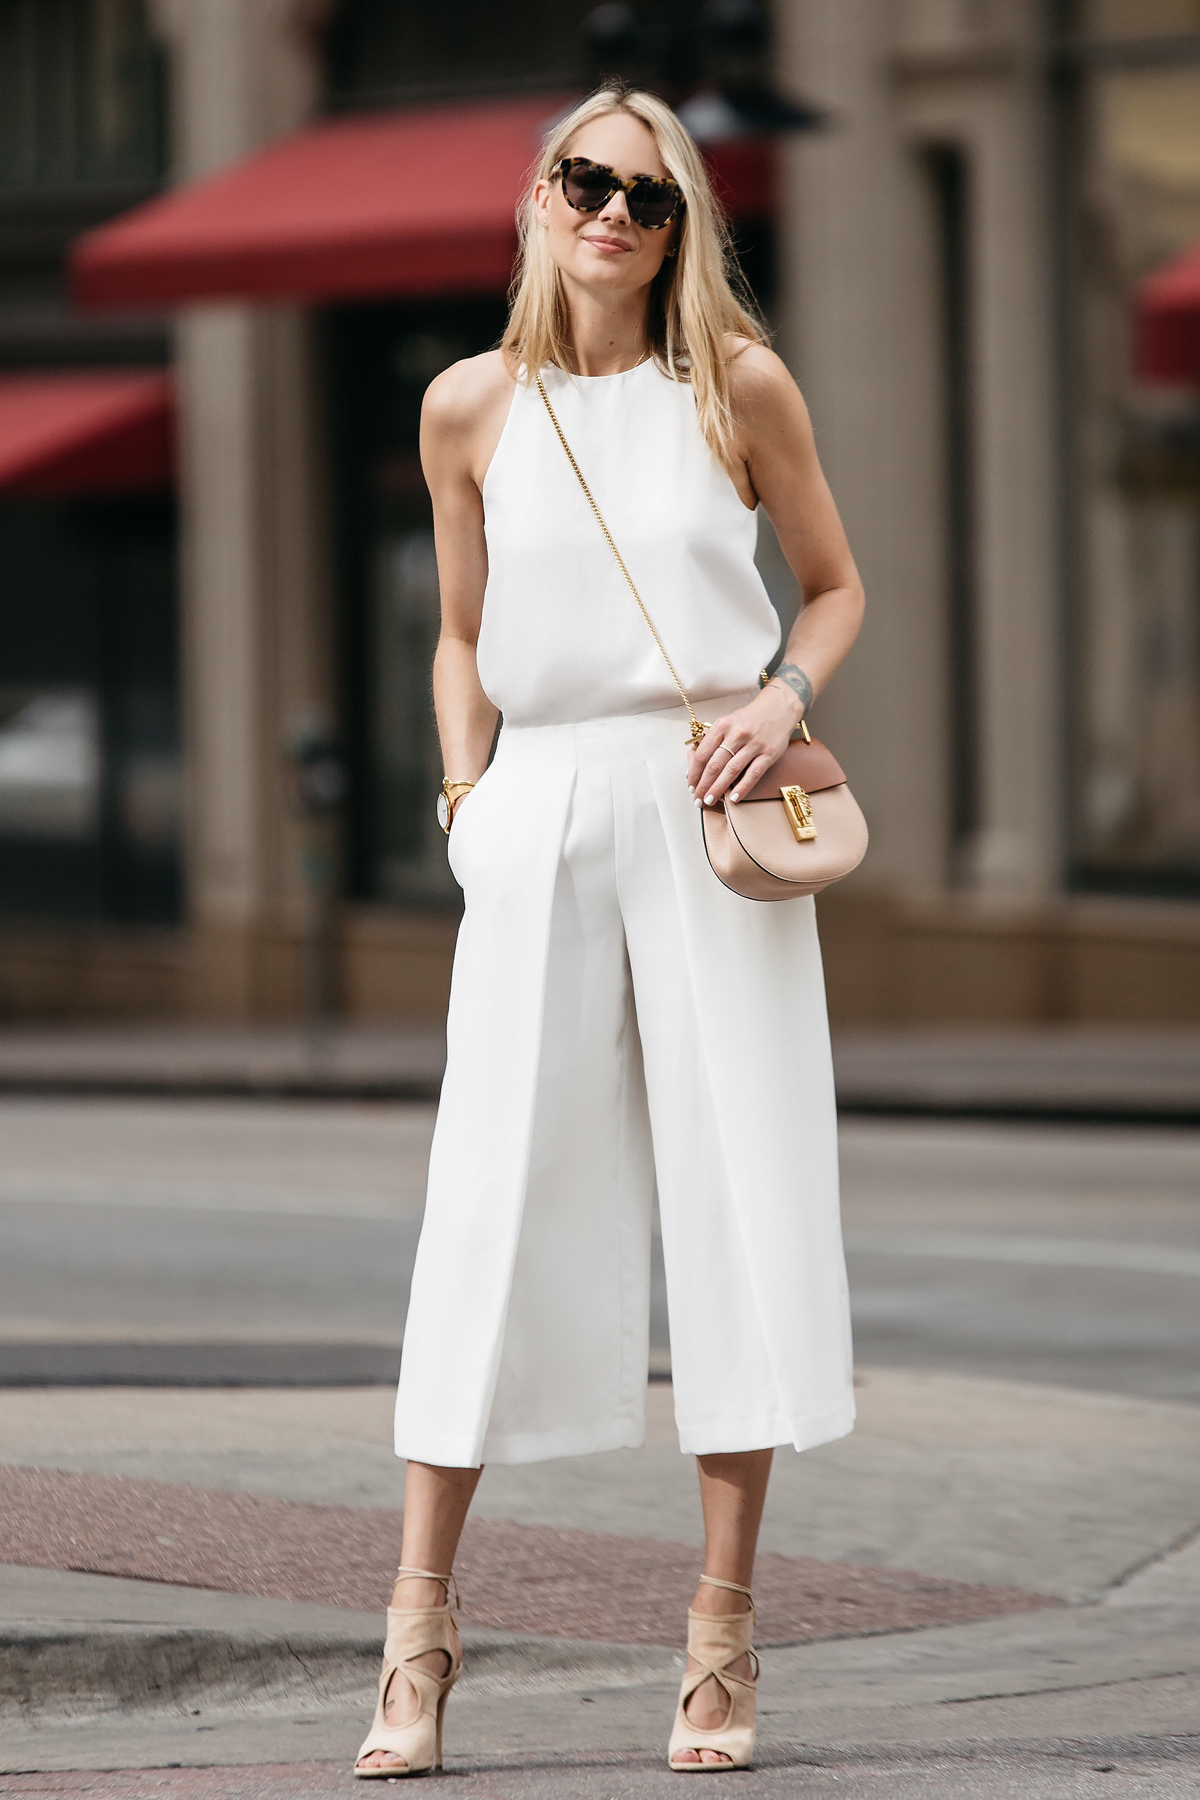 quần culottes trắng áo yếm monochrome fashionjackson